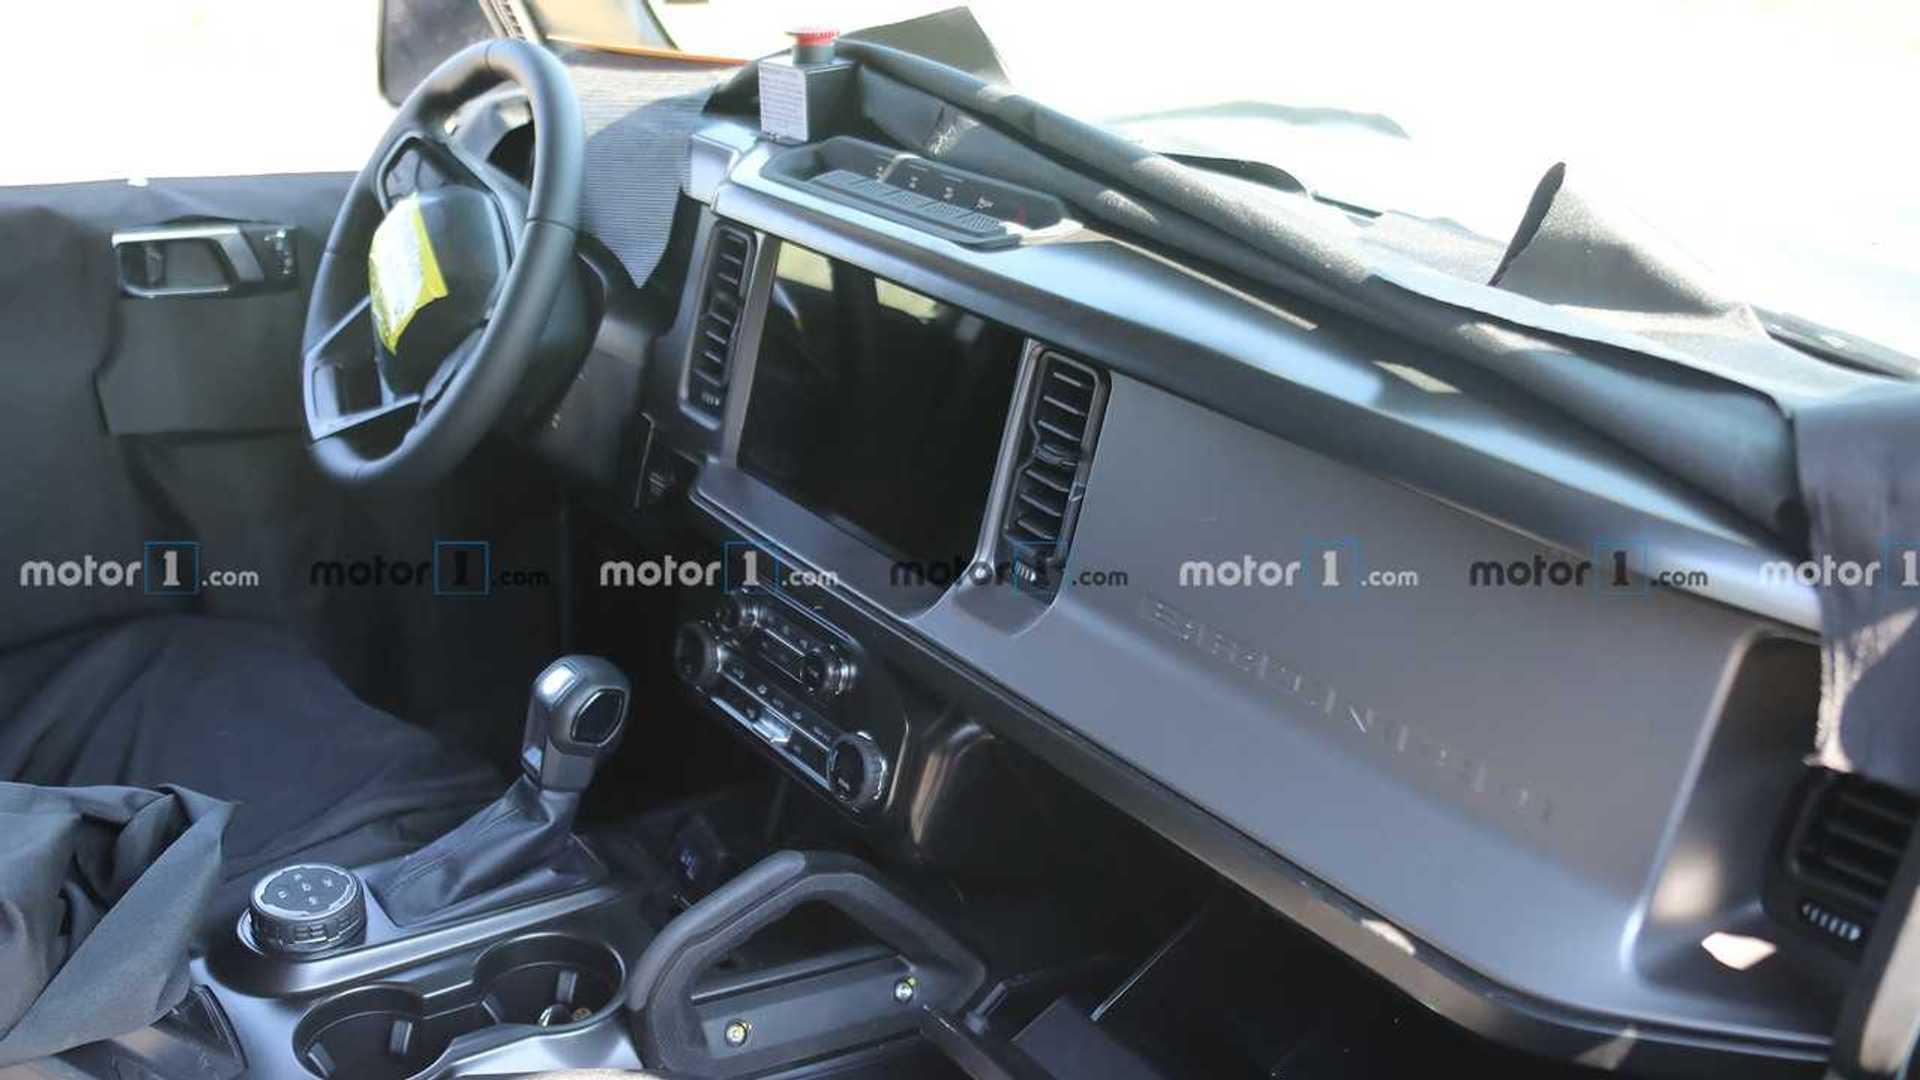 2021 Ford Bronco Spy Shots Reveal Off-Roader's Interior